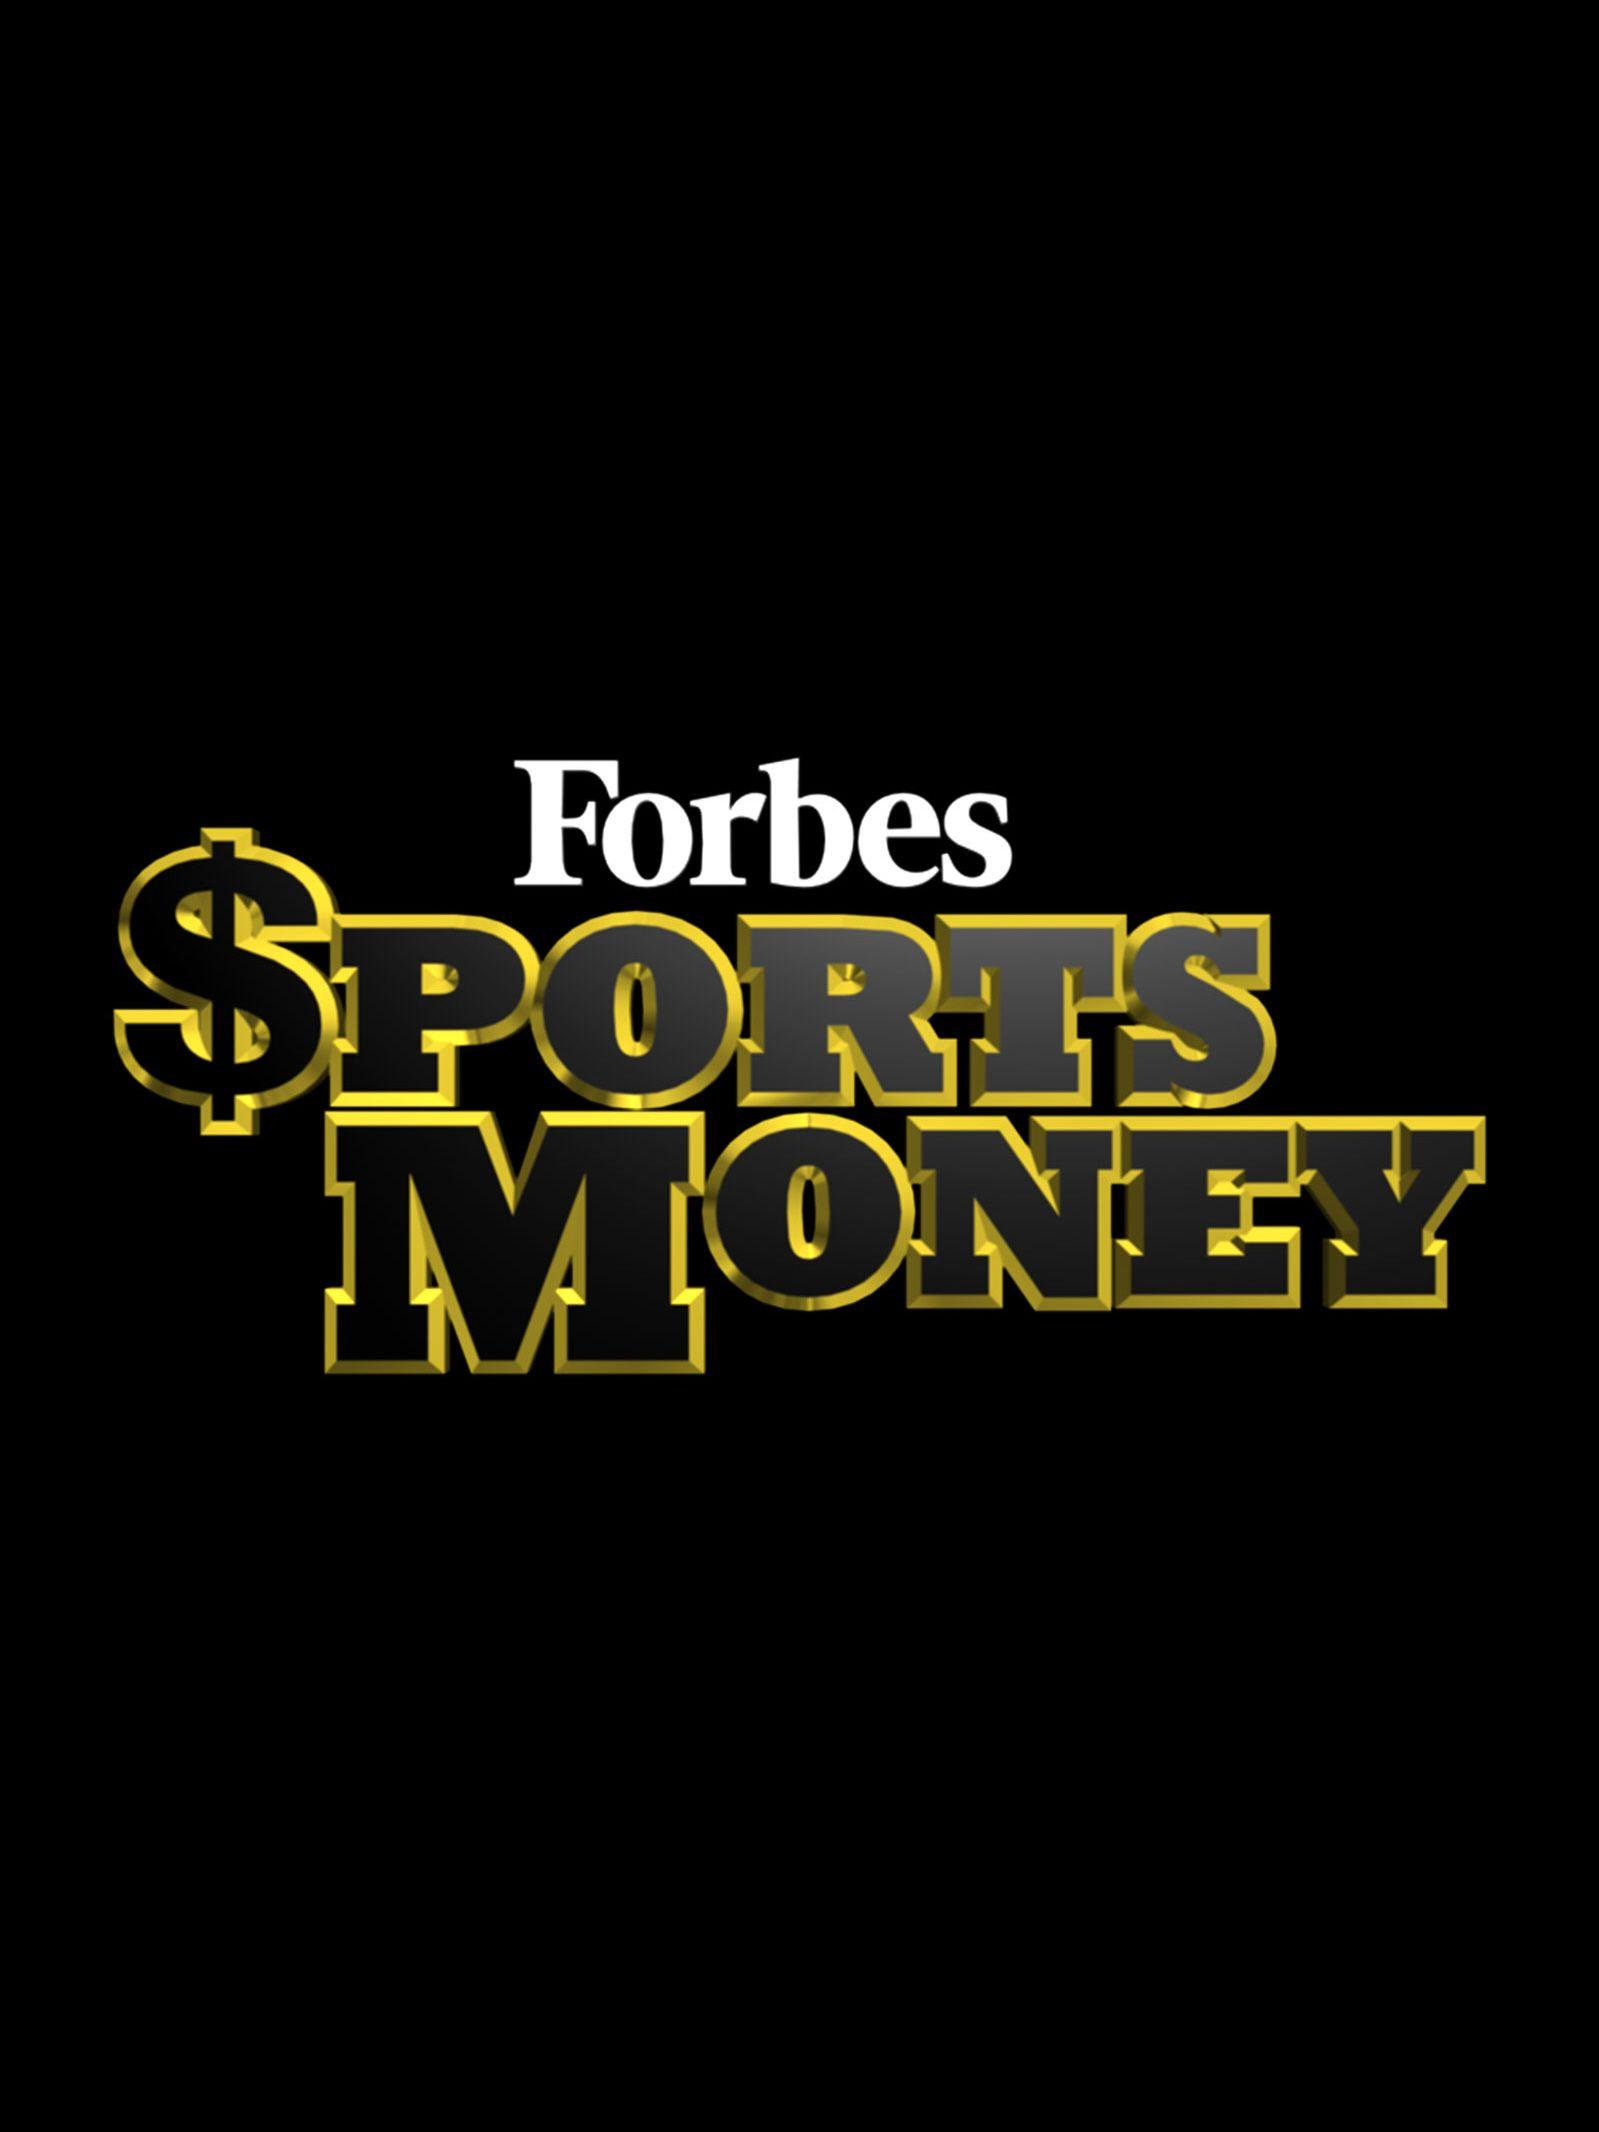 ForbesSportsmoney.jpg